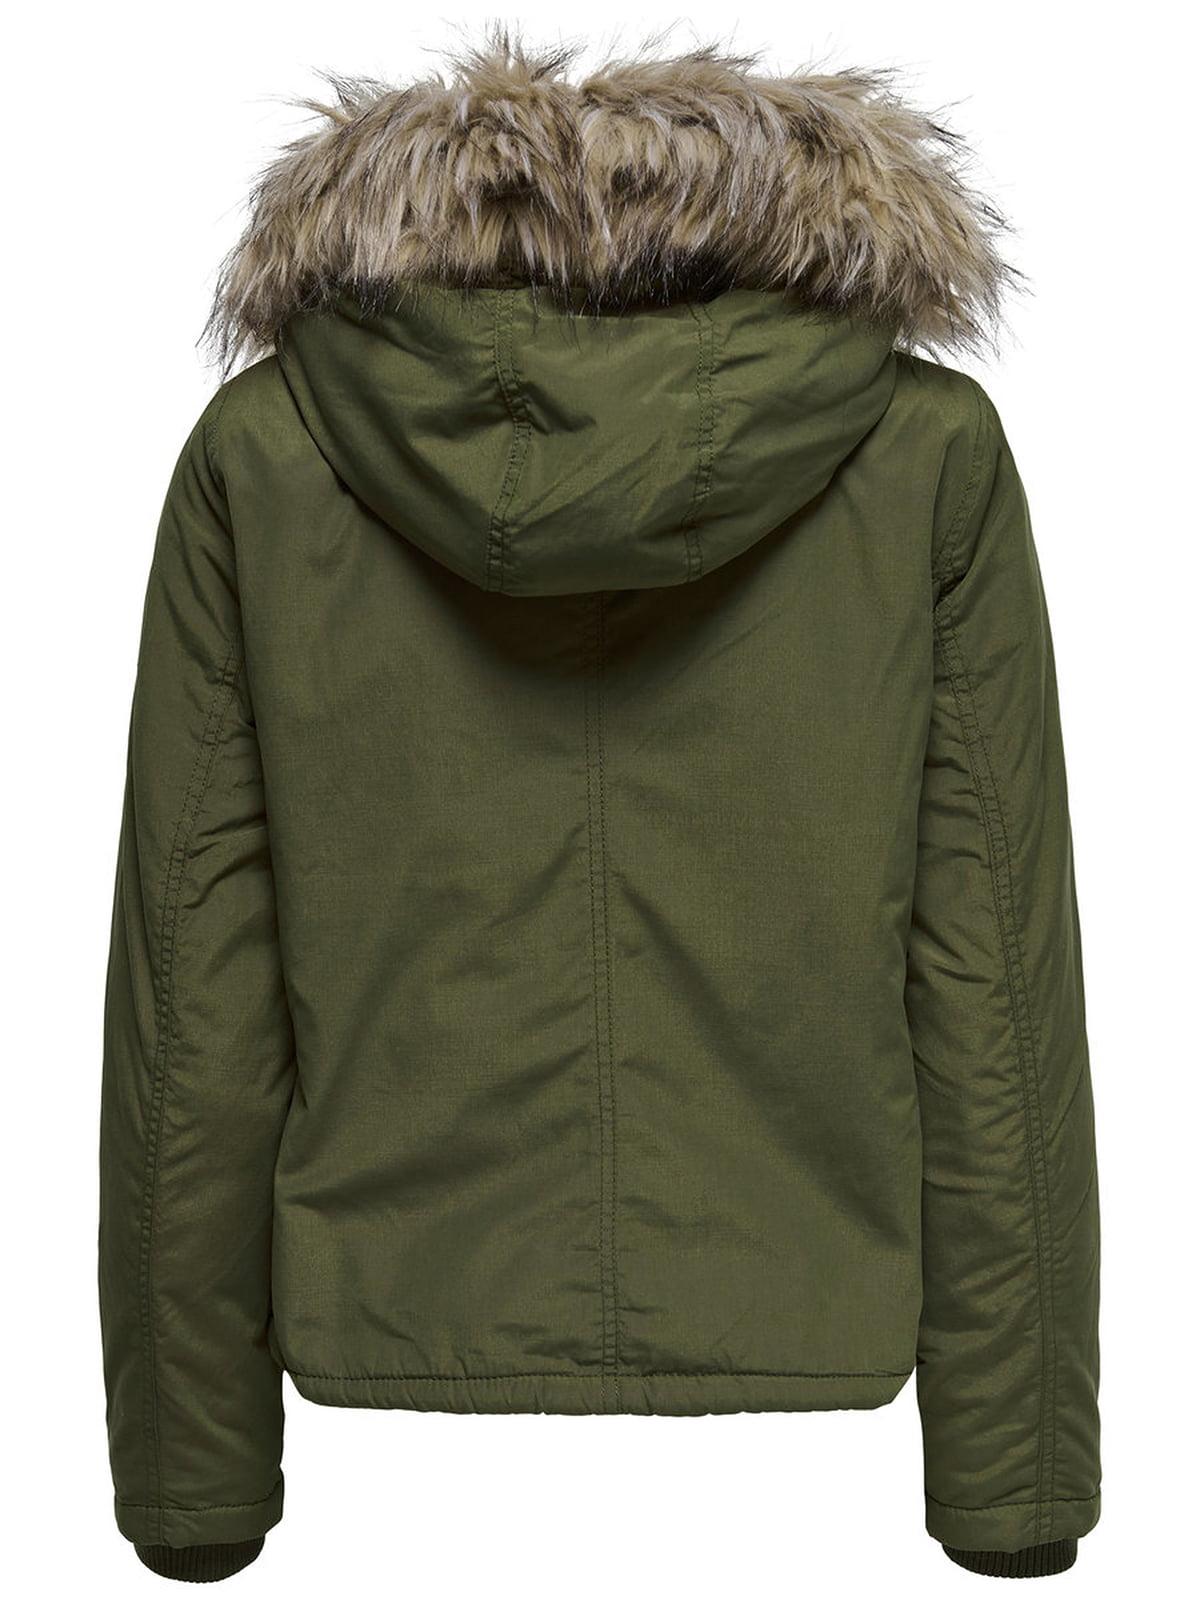 Куртка зелена | 4561451 | фото 5